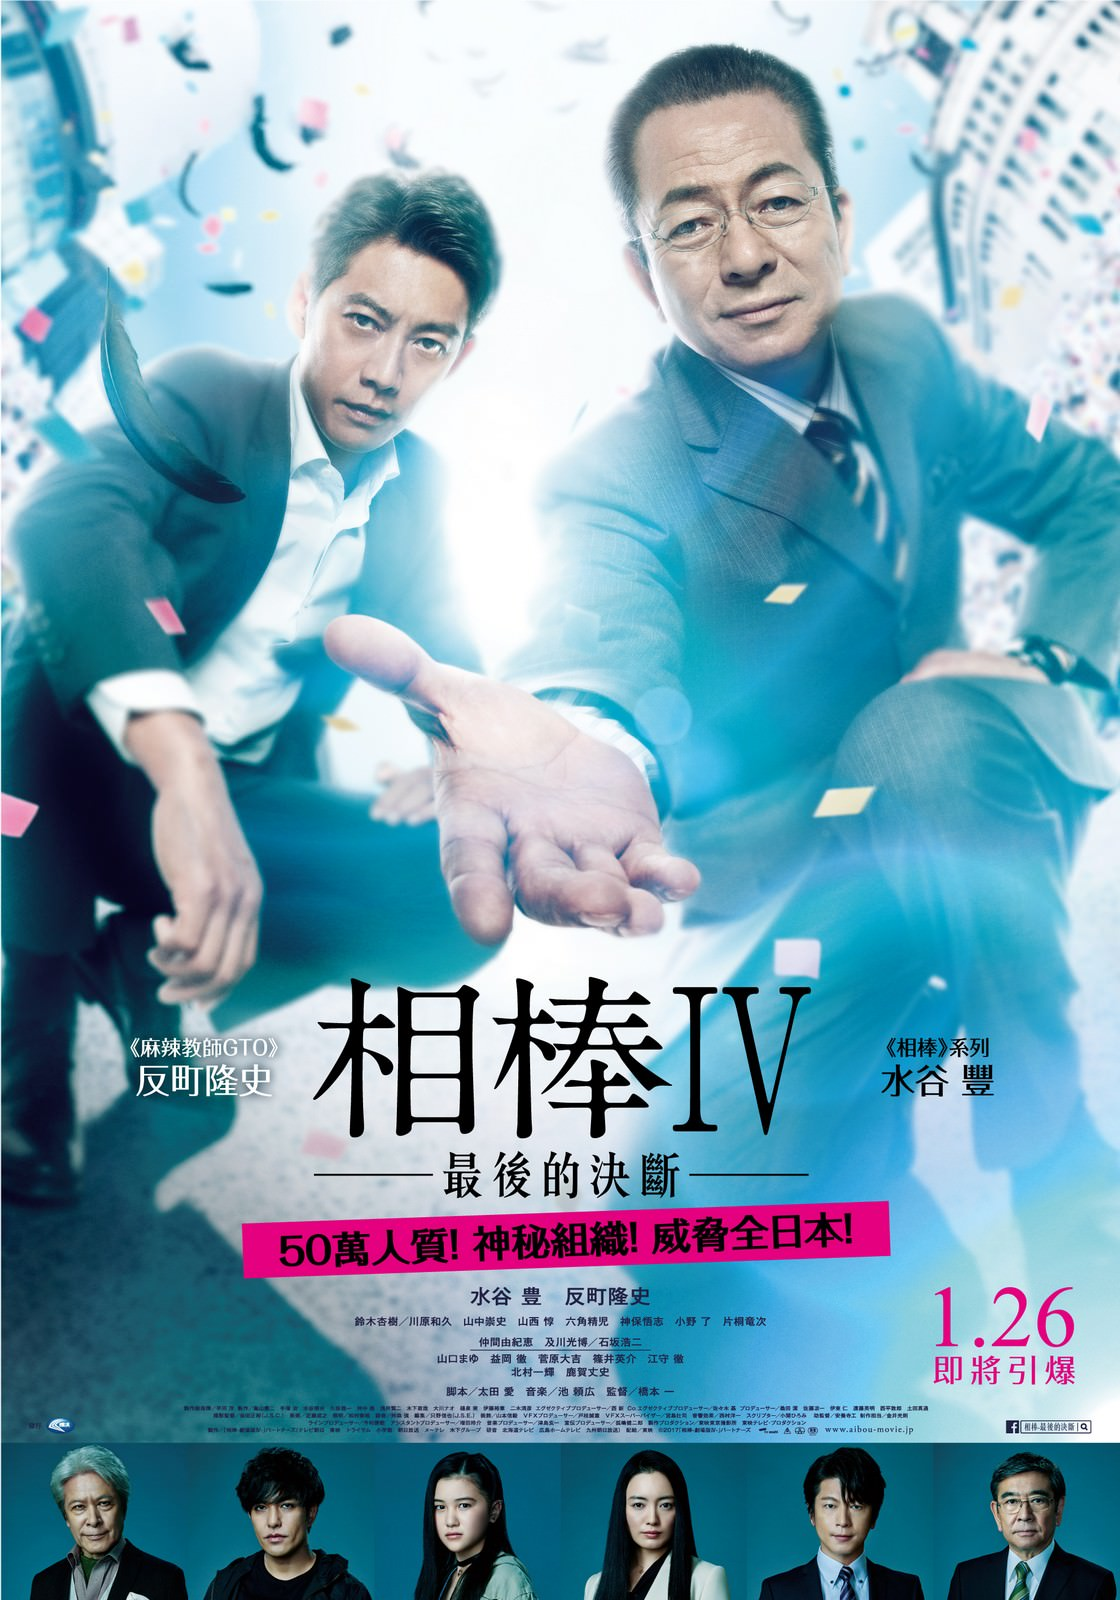 Movie, 相棒IV:最後的決斷 / 相棒-劇場版IV-(日本, 2017年) / Aibou: The Movie IV(英文), 電影海報, 台灣